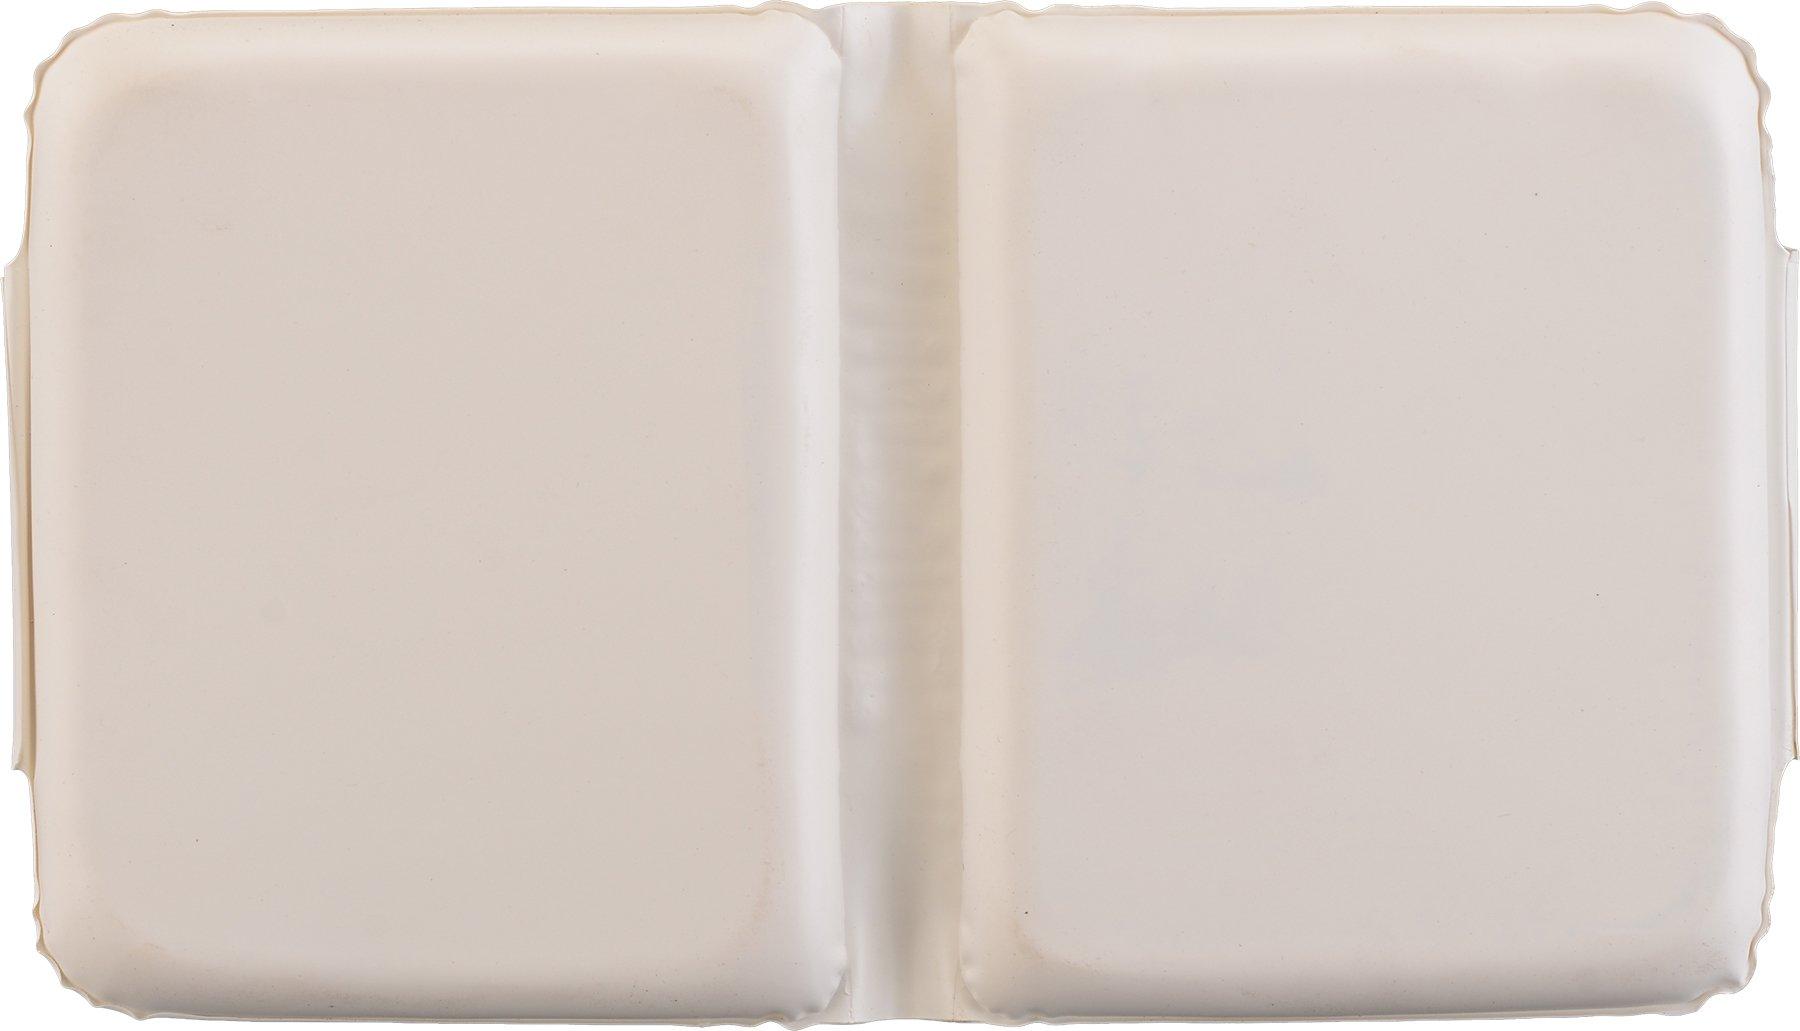 NOVA Medical Products Bath Seat Cushion, White, 1 Pound